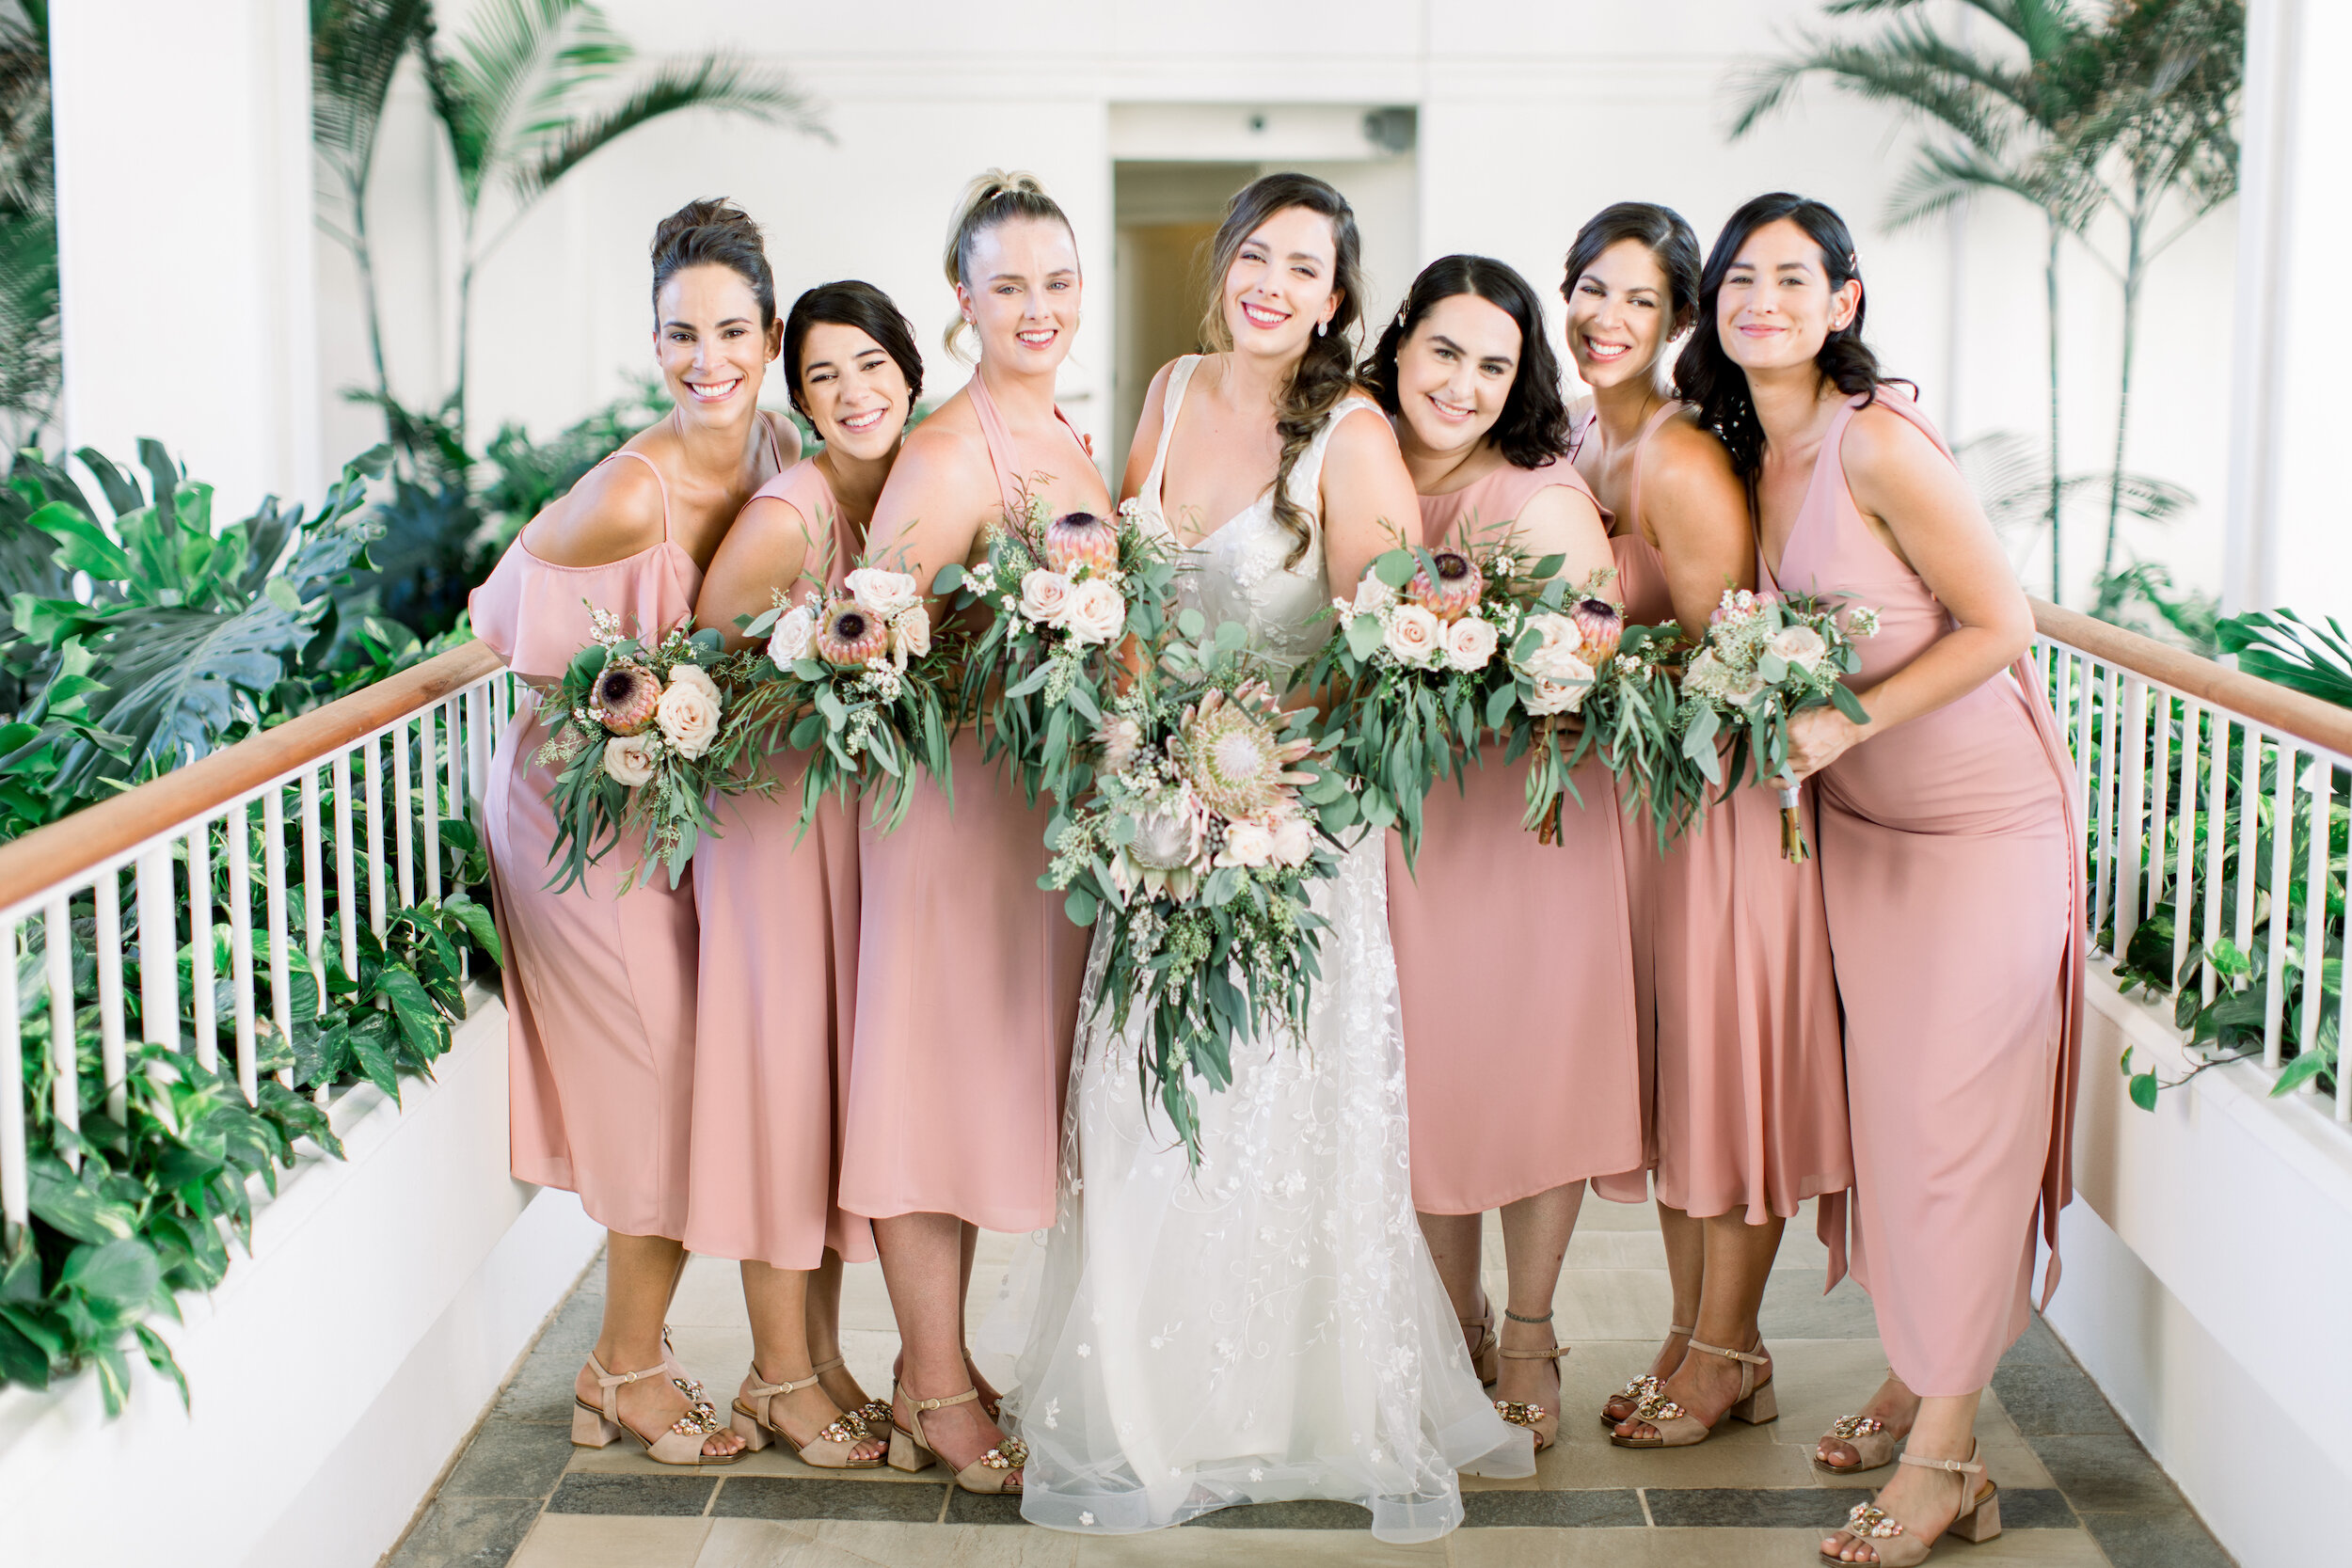 Wedding Hair and Makeup - Oahu Hawaii